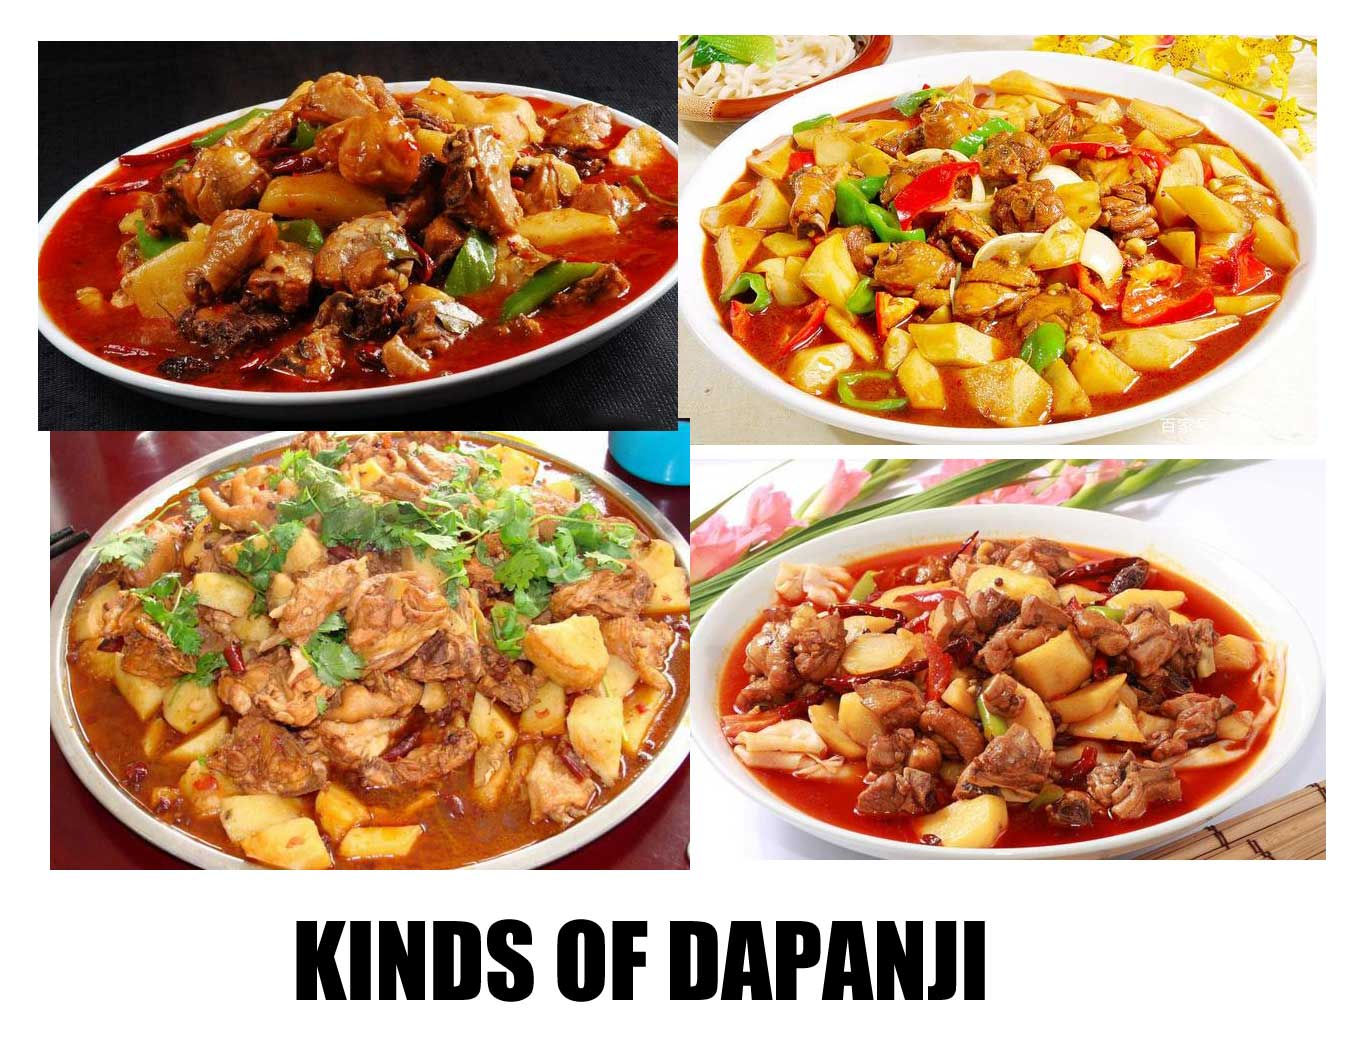 kinds of dapanji